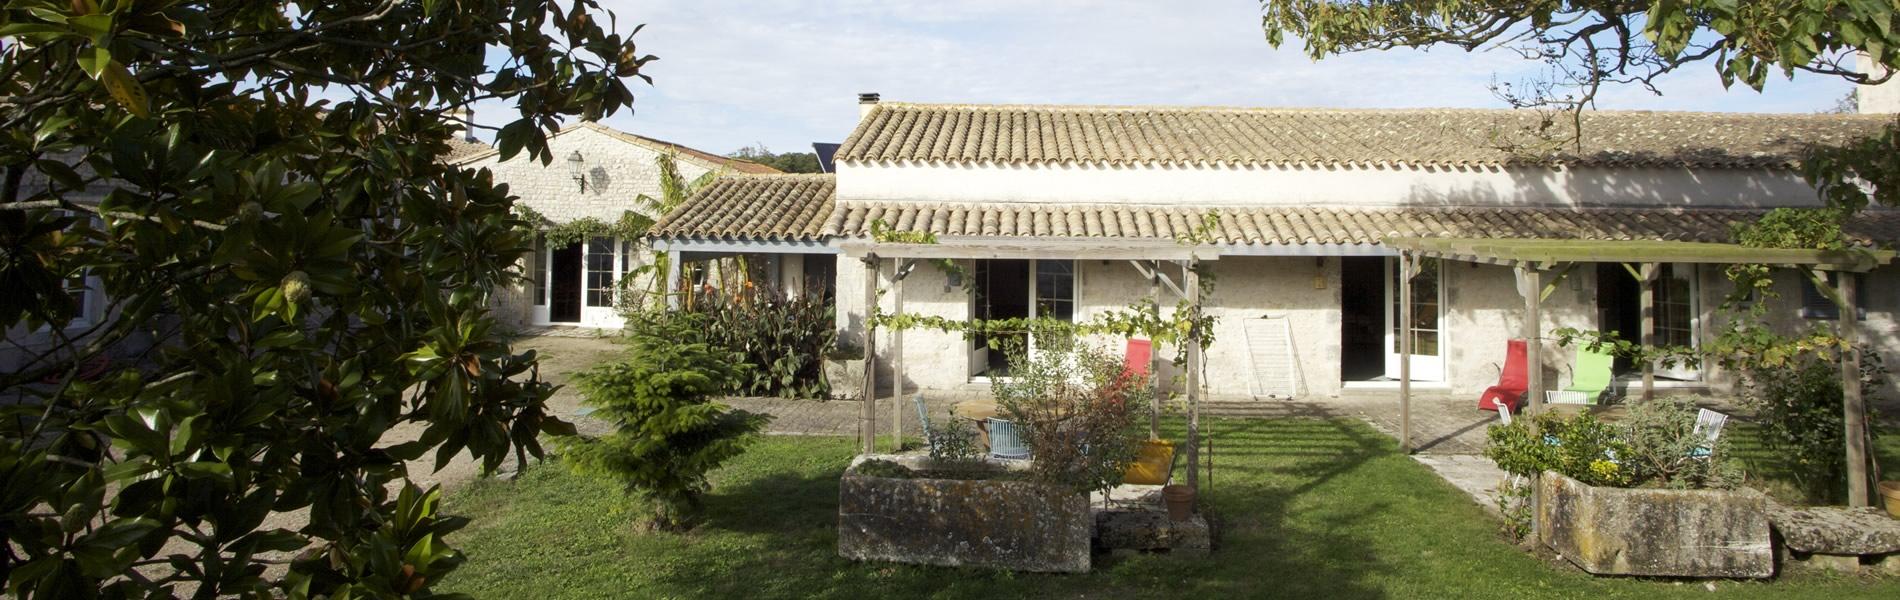 Gîte La Rochelle